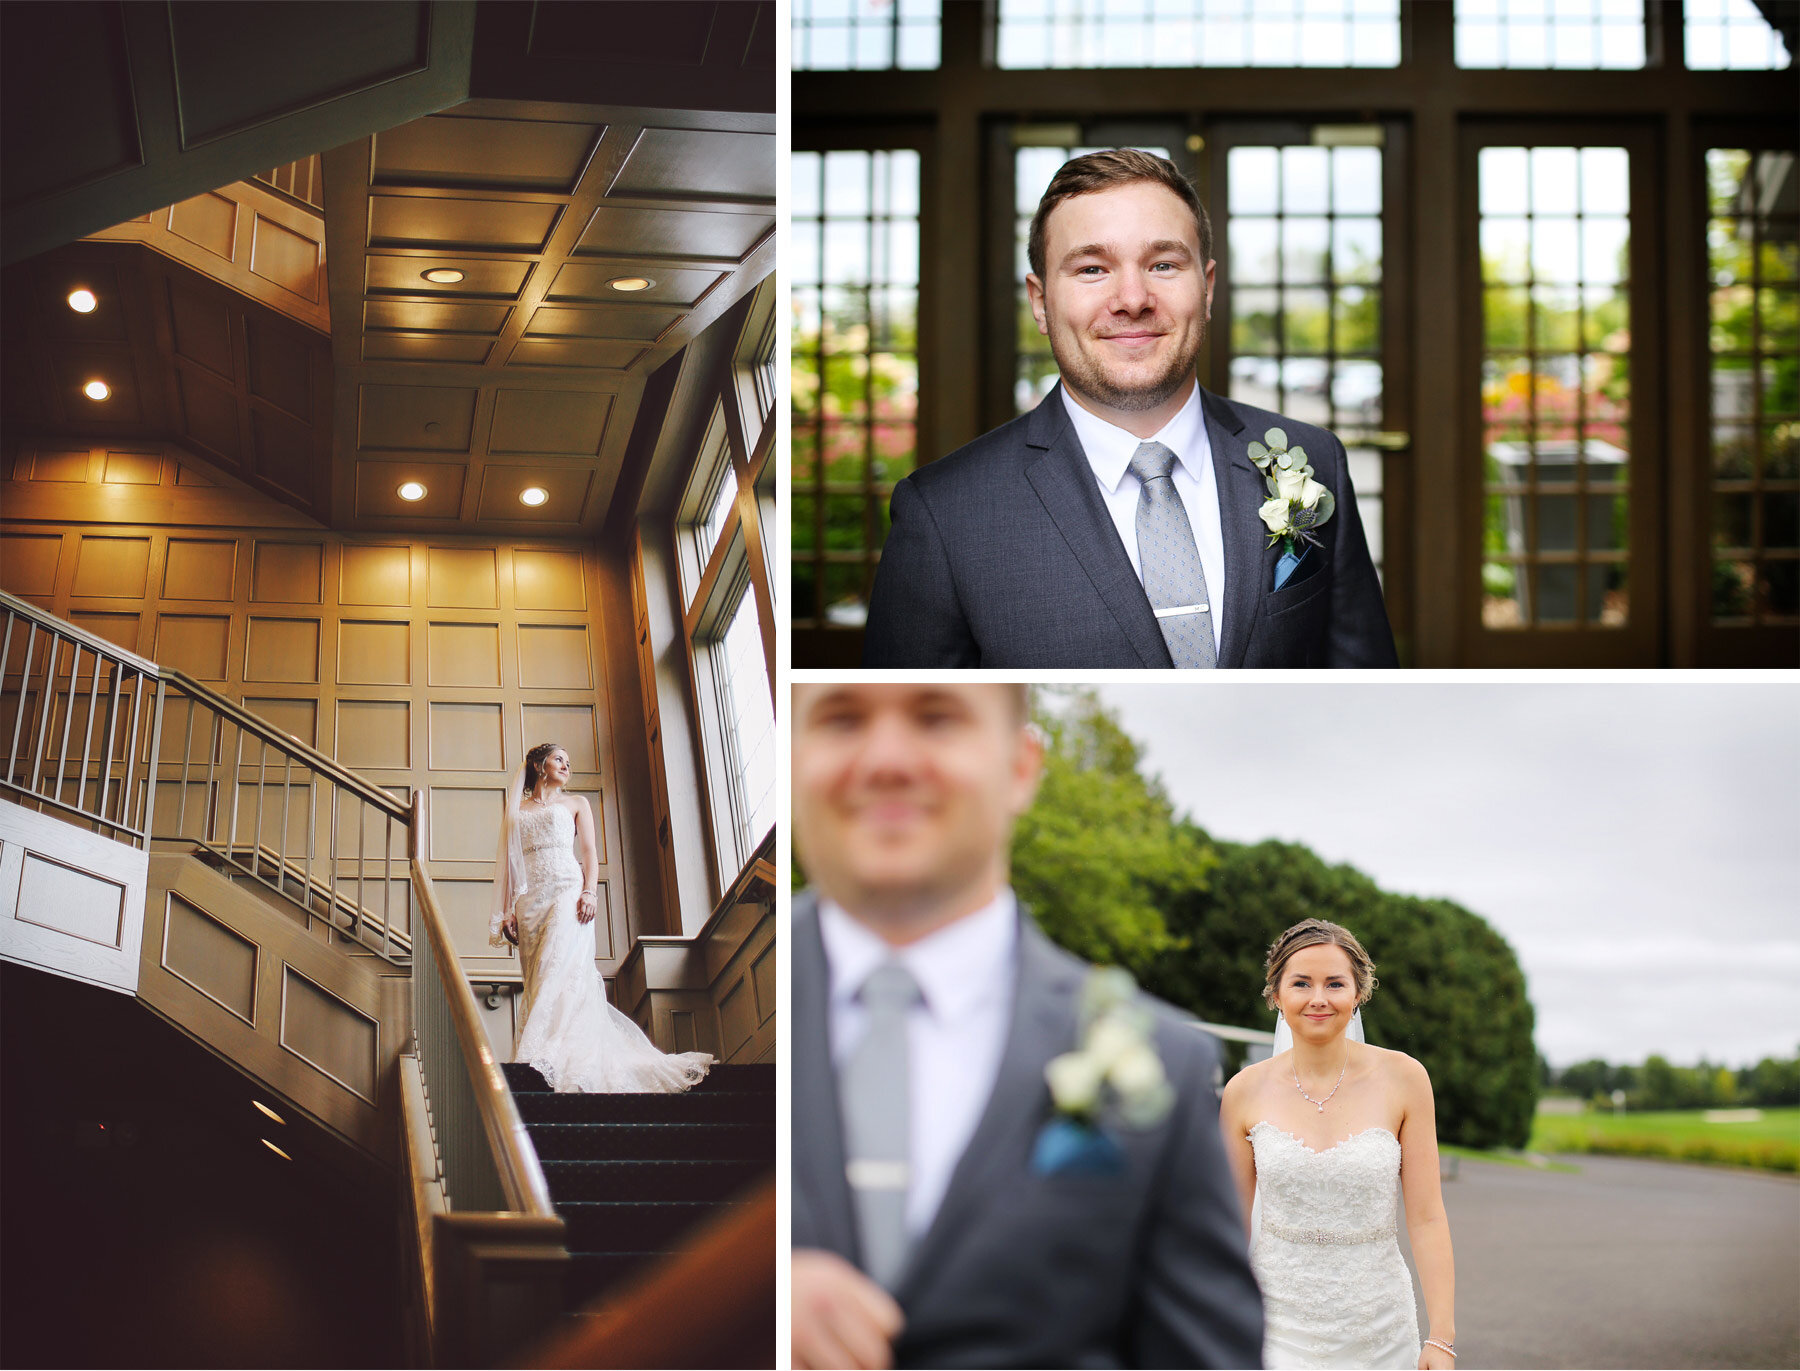 01-Vick-Photography-Minneapolis-Minnesota-Wedding-Rush-Creek-Golf-Club-Groom-Bride-Staircase-Amanda-and-Michael.jpg